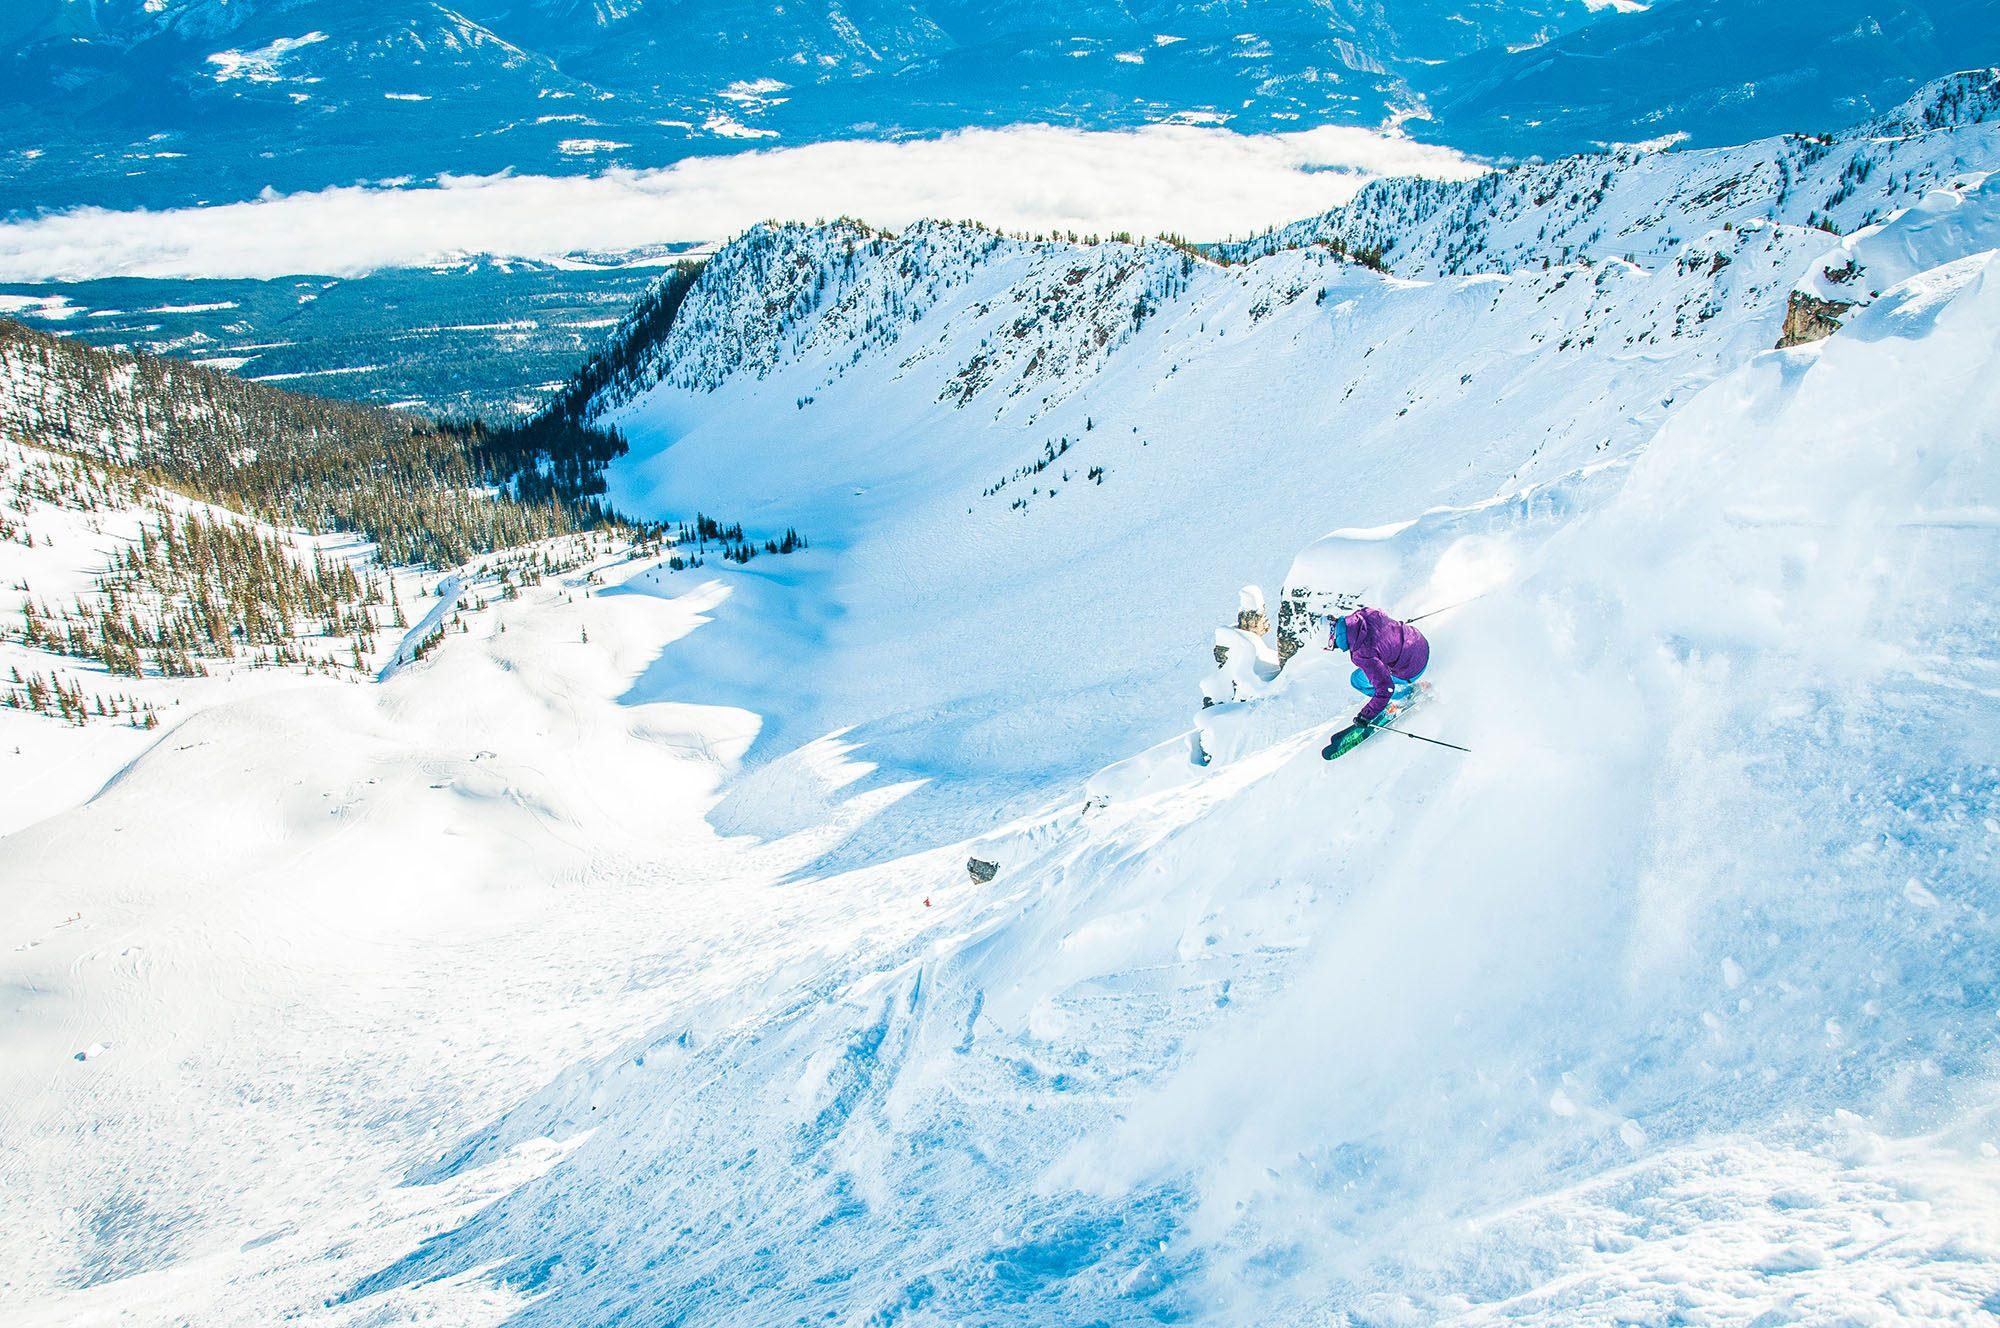 (Trent Bona/Kicking Horse Mountain Resort/RCR)